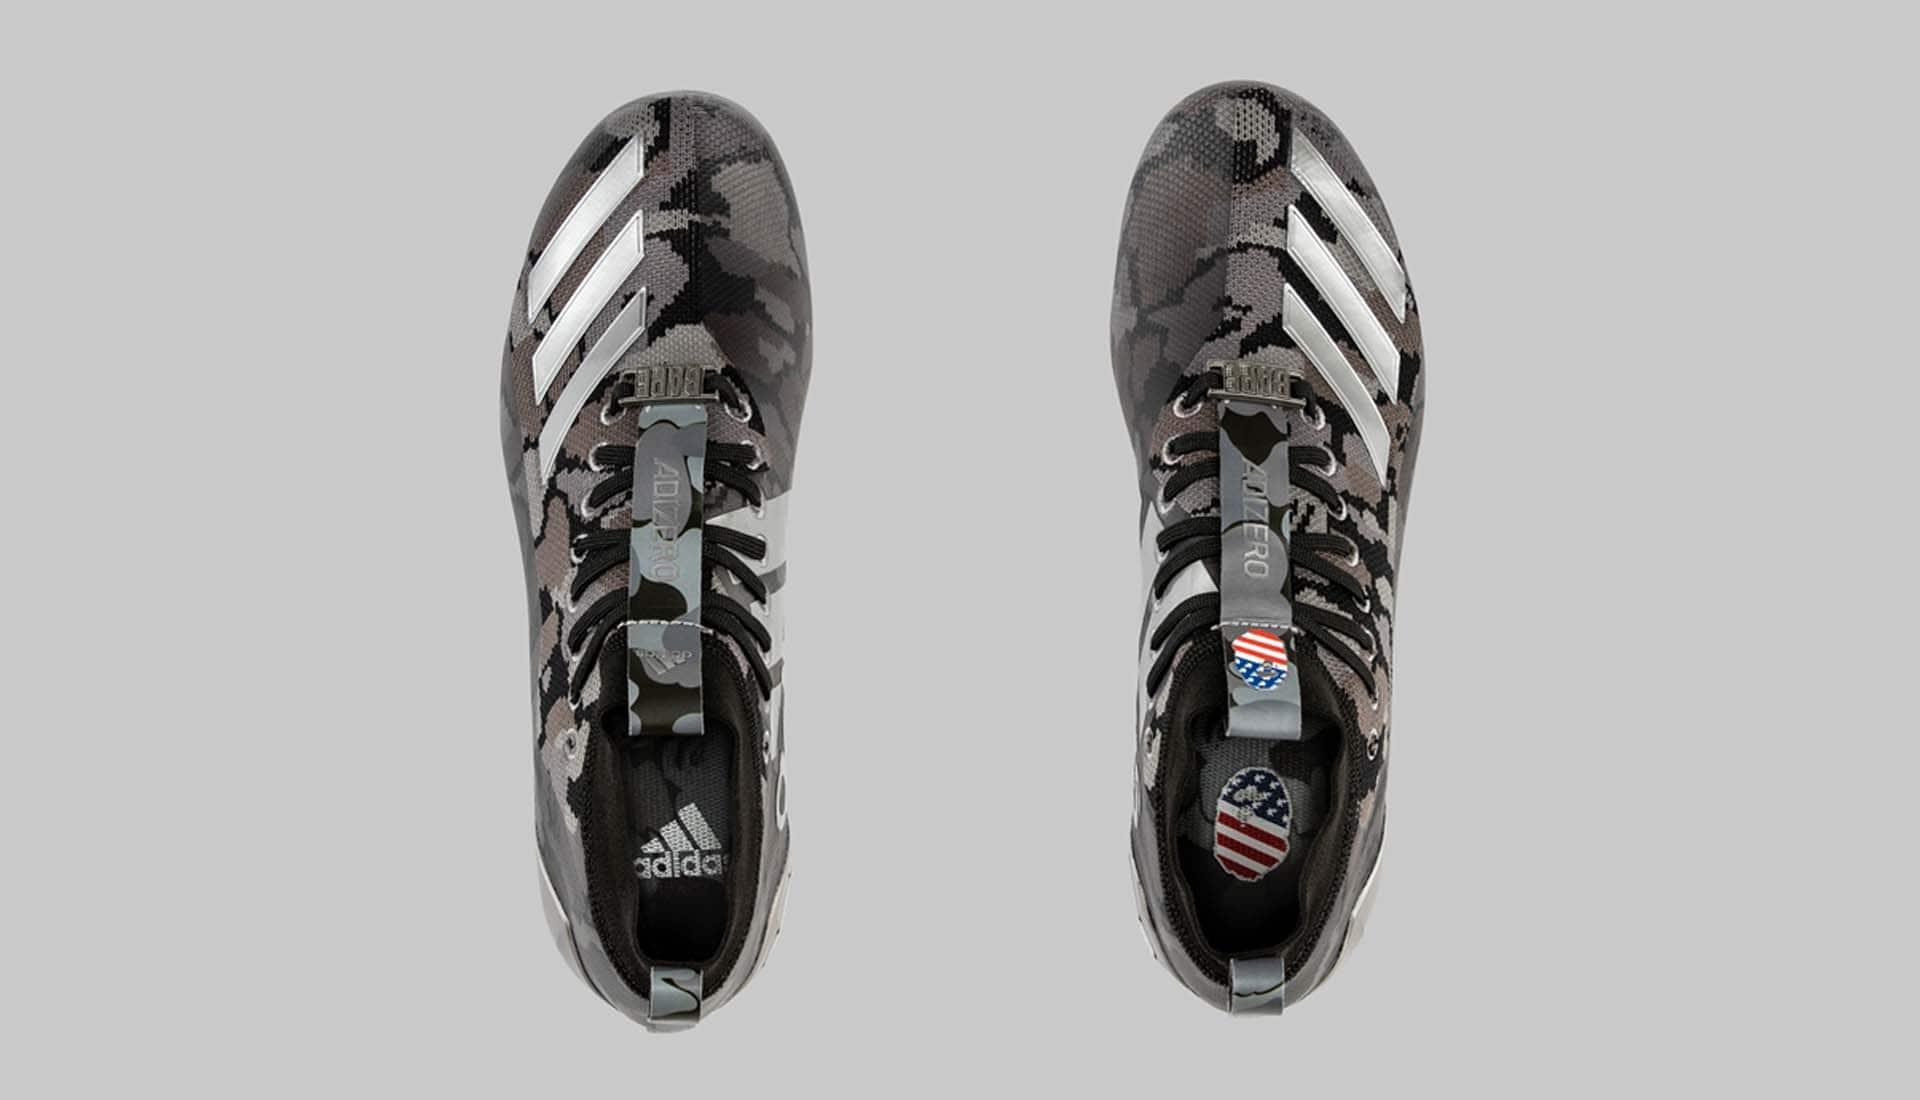 0bb5eb842 adidas launch BAPE Adizero 8.0 - SoccerBible